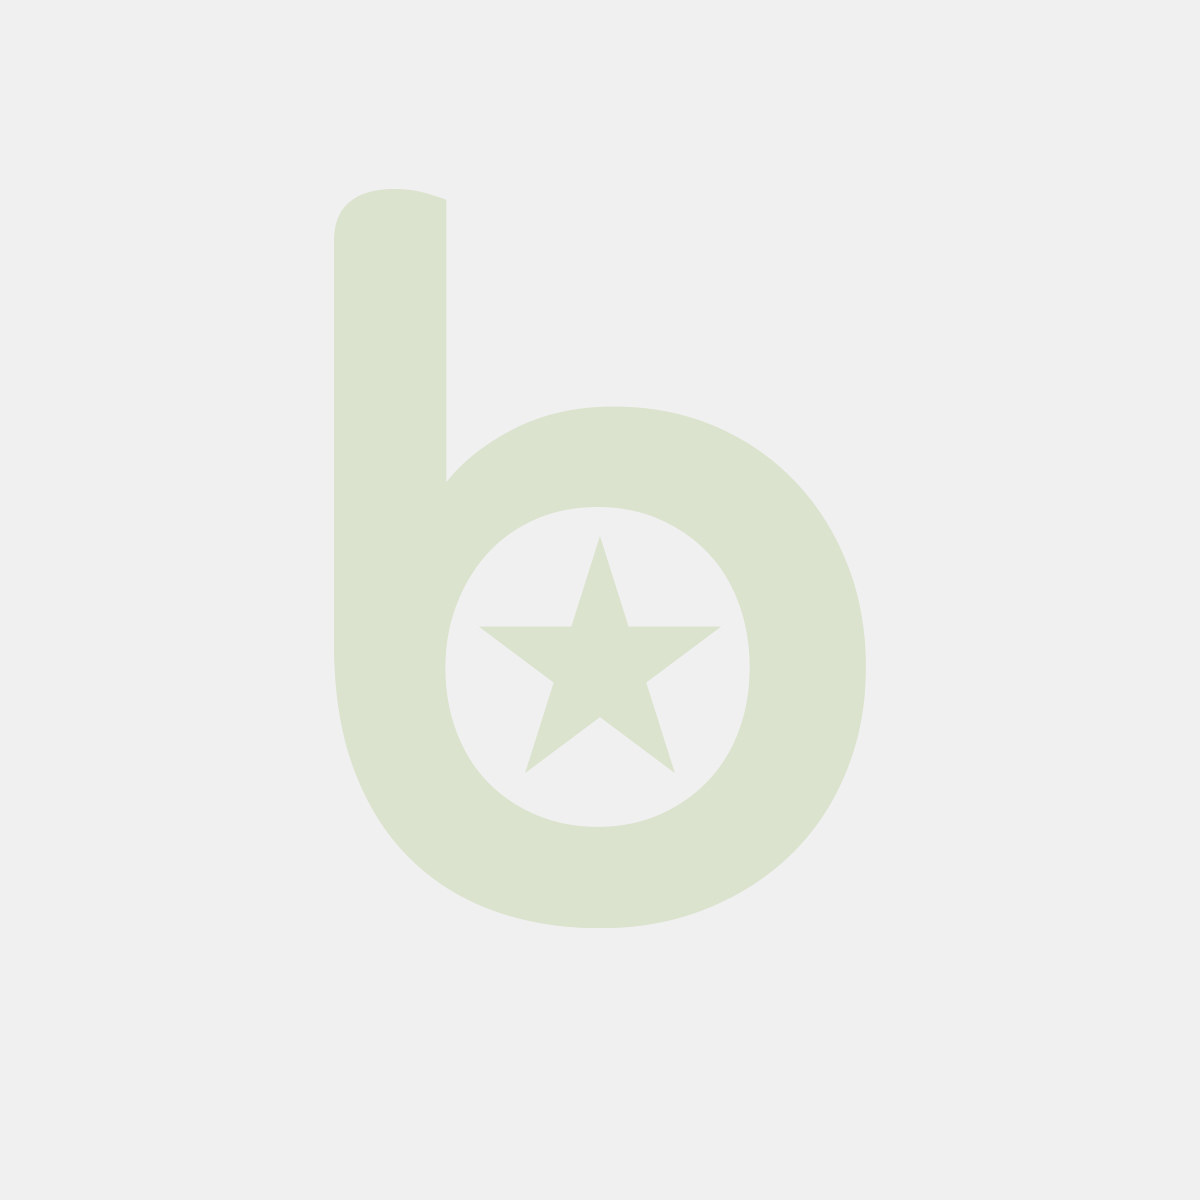 Kubek brąz-biały (pion. prążkowany) 150ml PS, cena za 100 sztuk